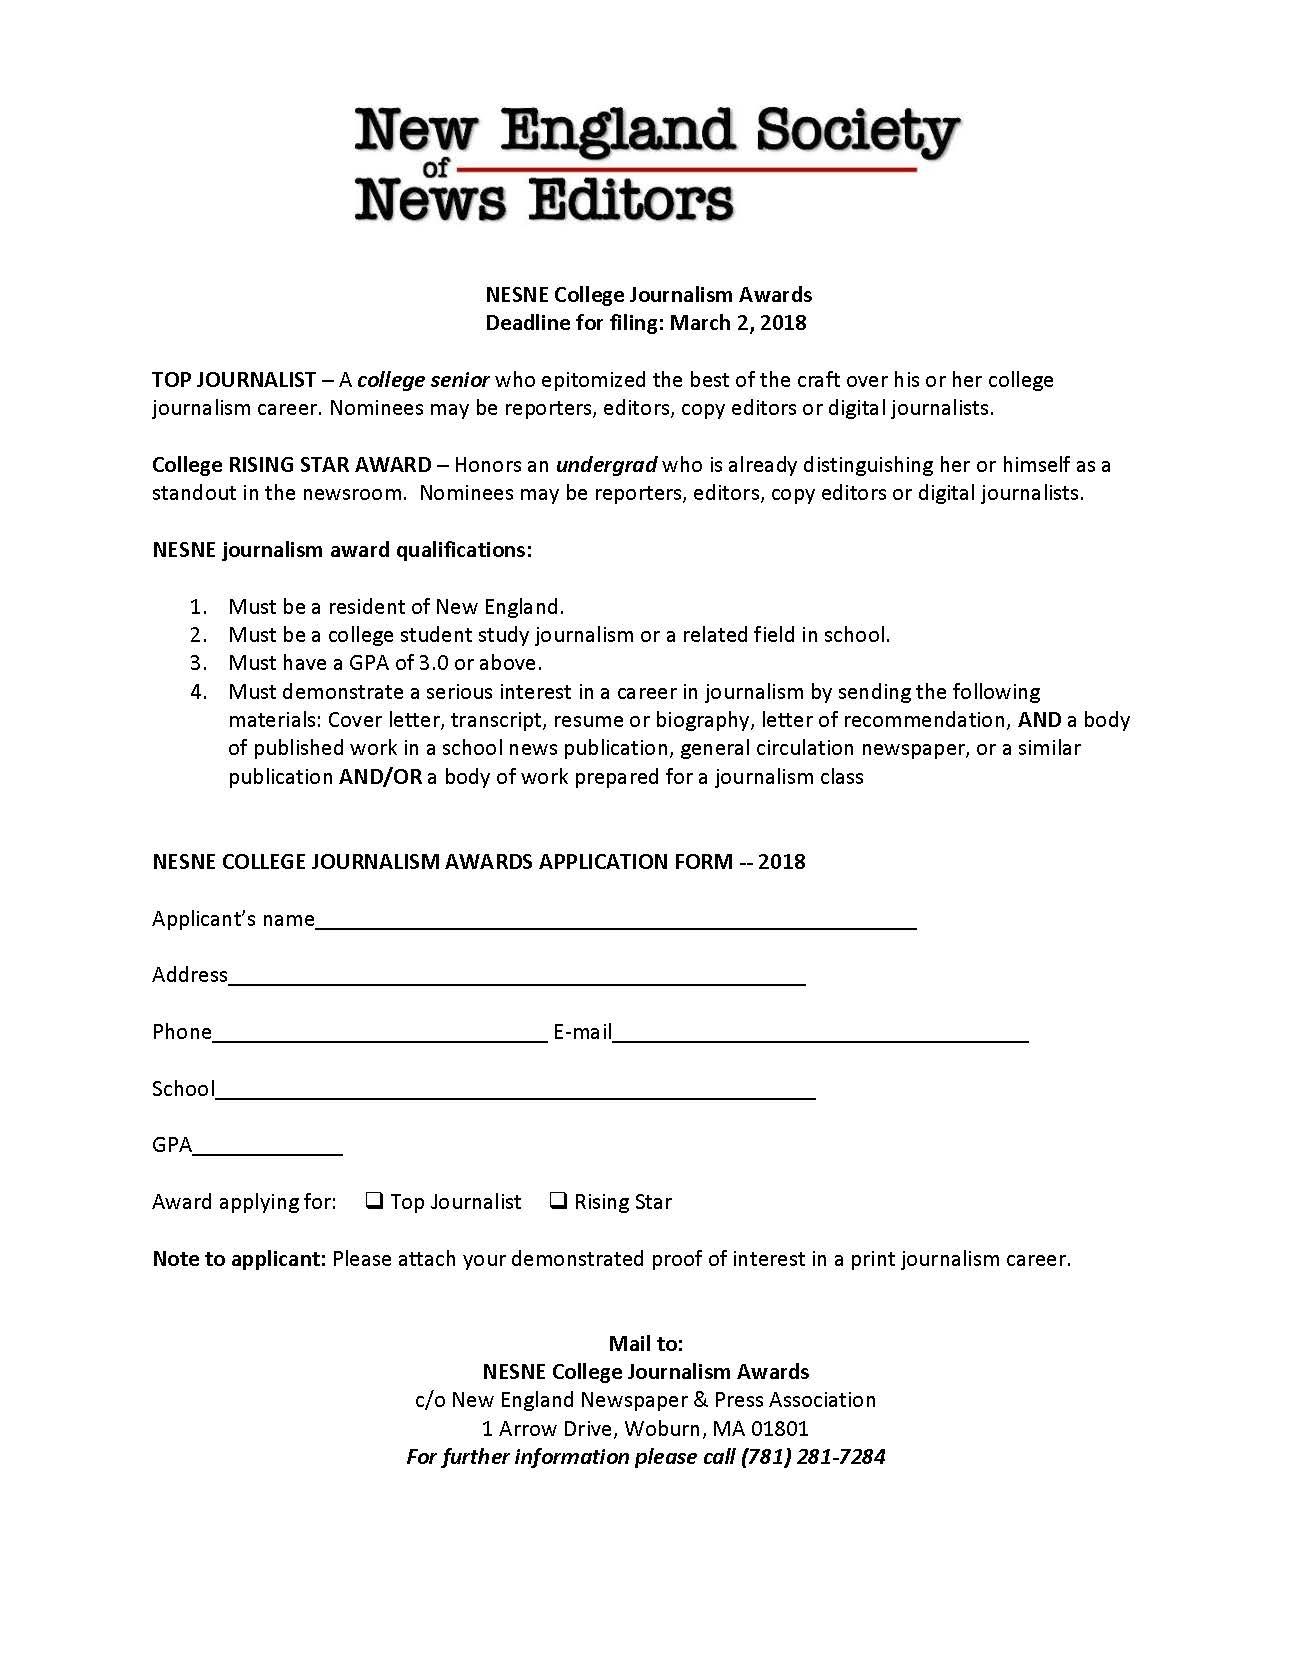 nesne college journalism awards application 2018